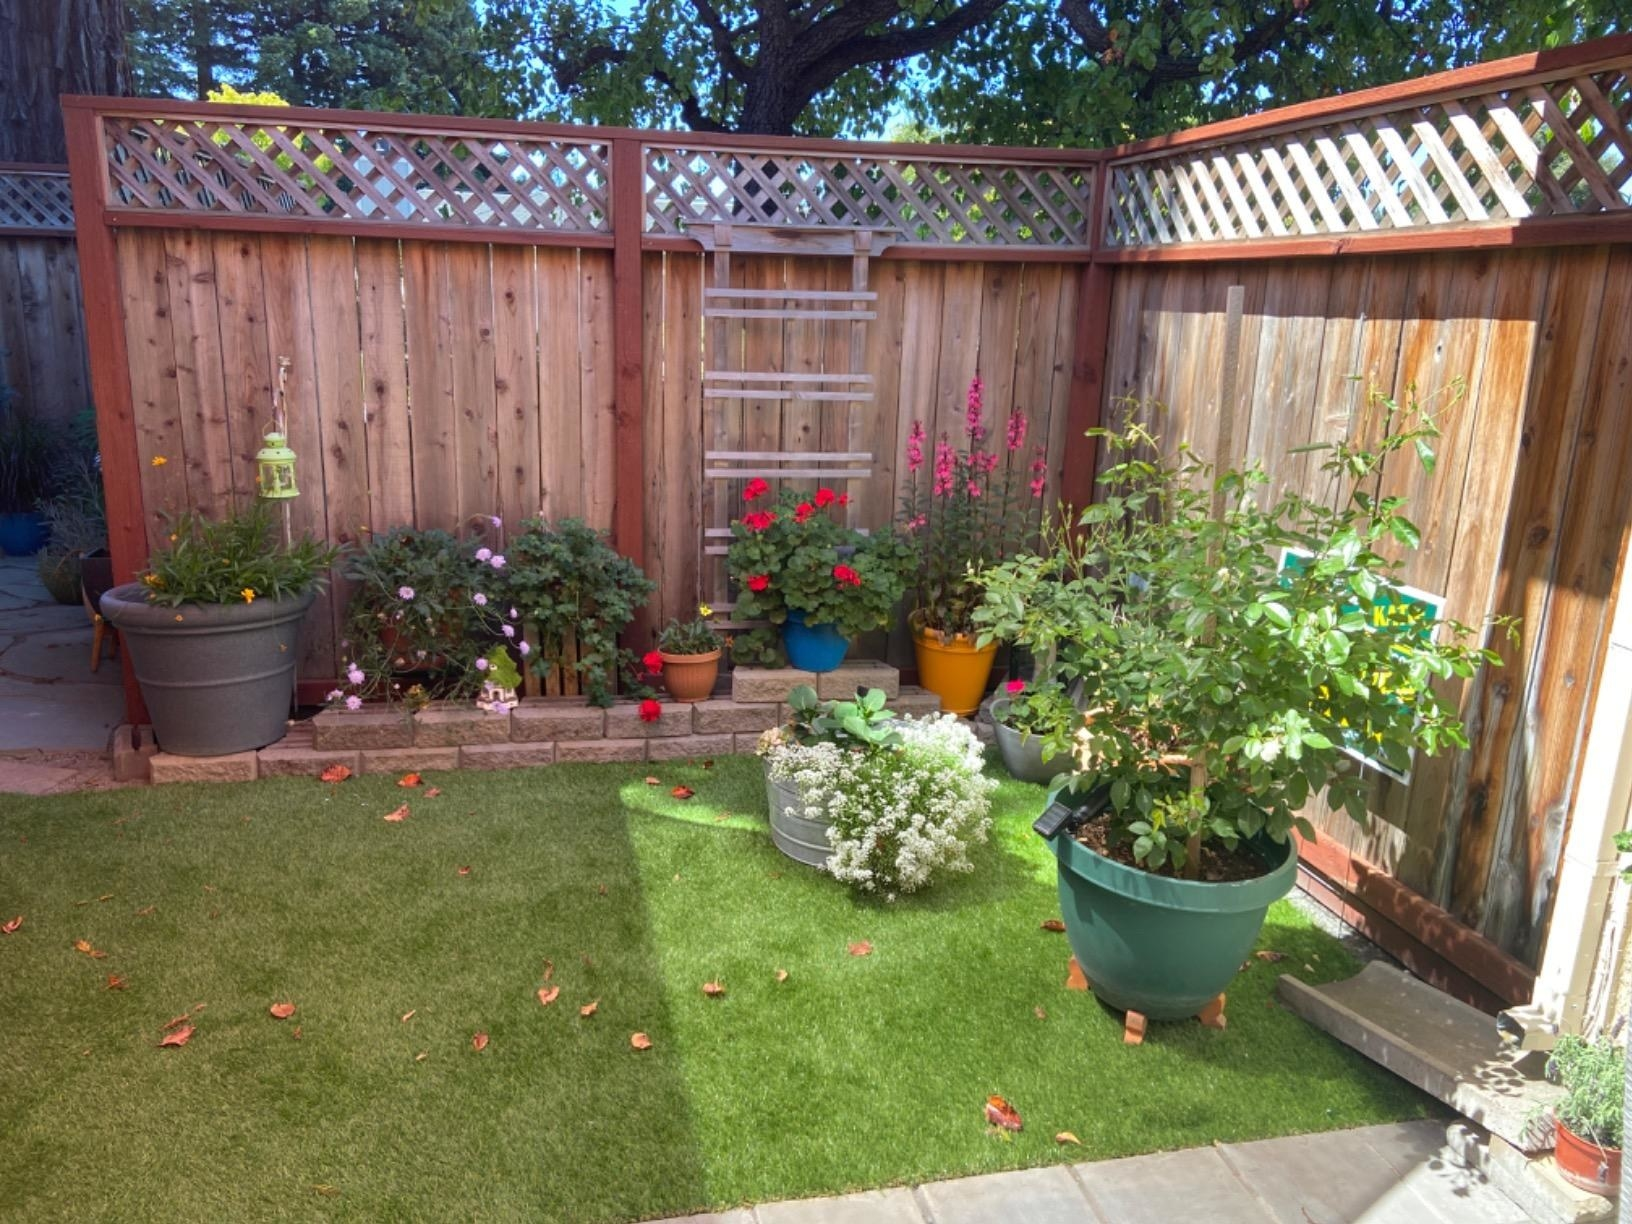 Reviewer photo of fake grass in their garden